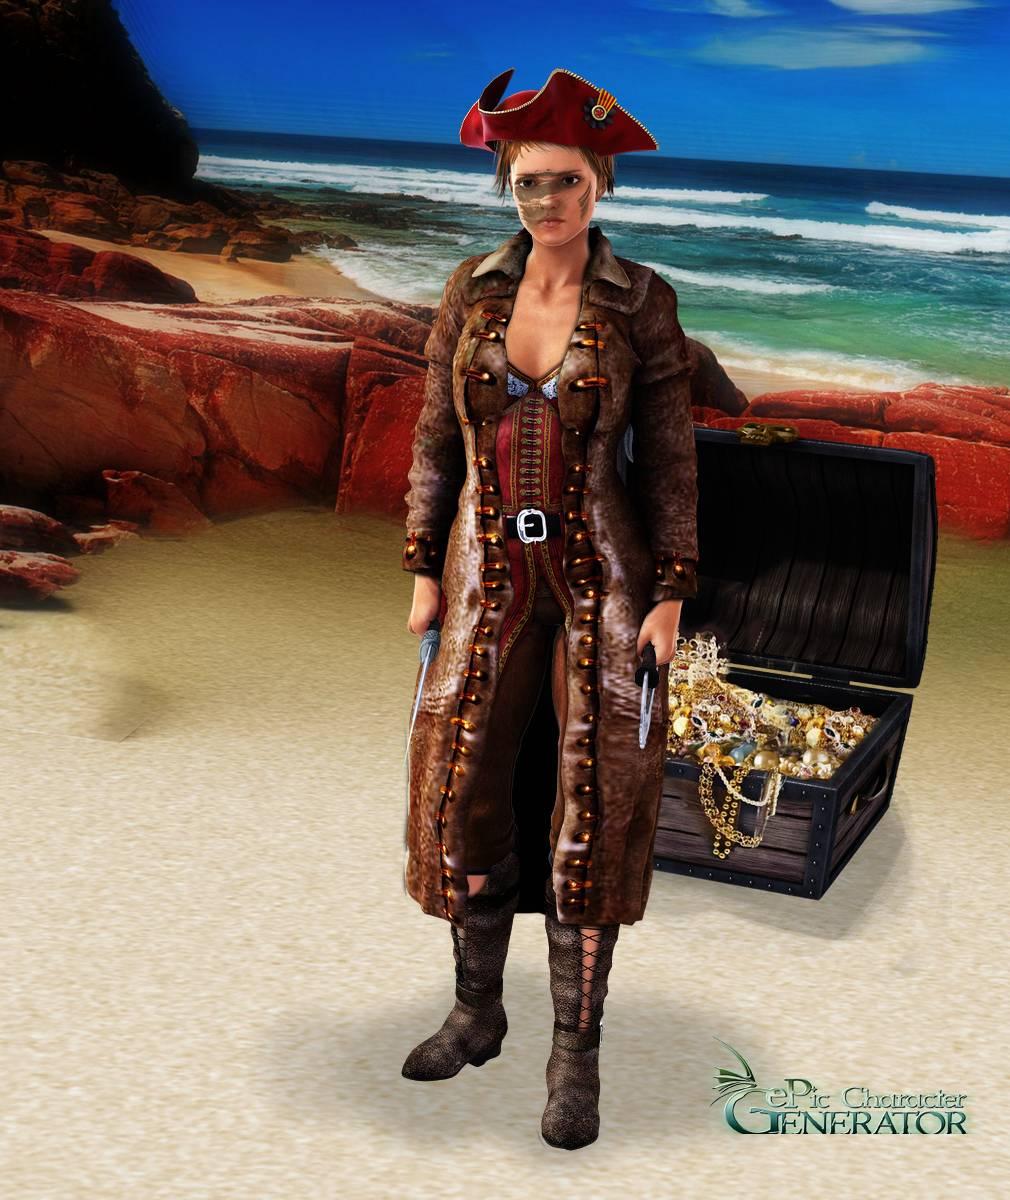 ePic Character Generator Season 2 Female Pirate Screenshot 10